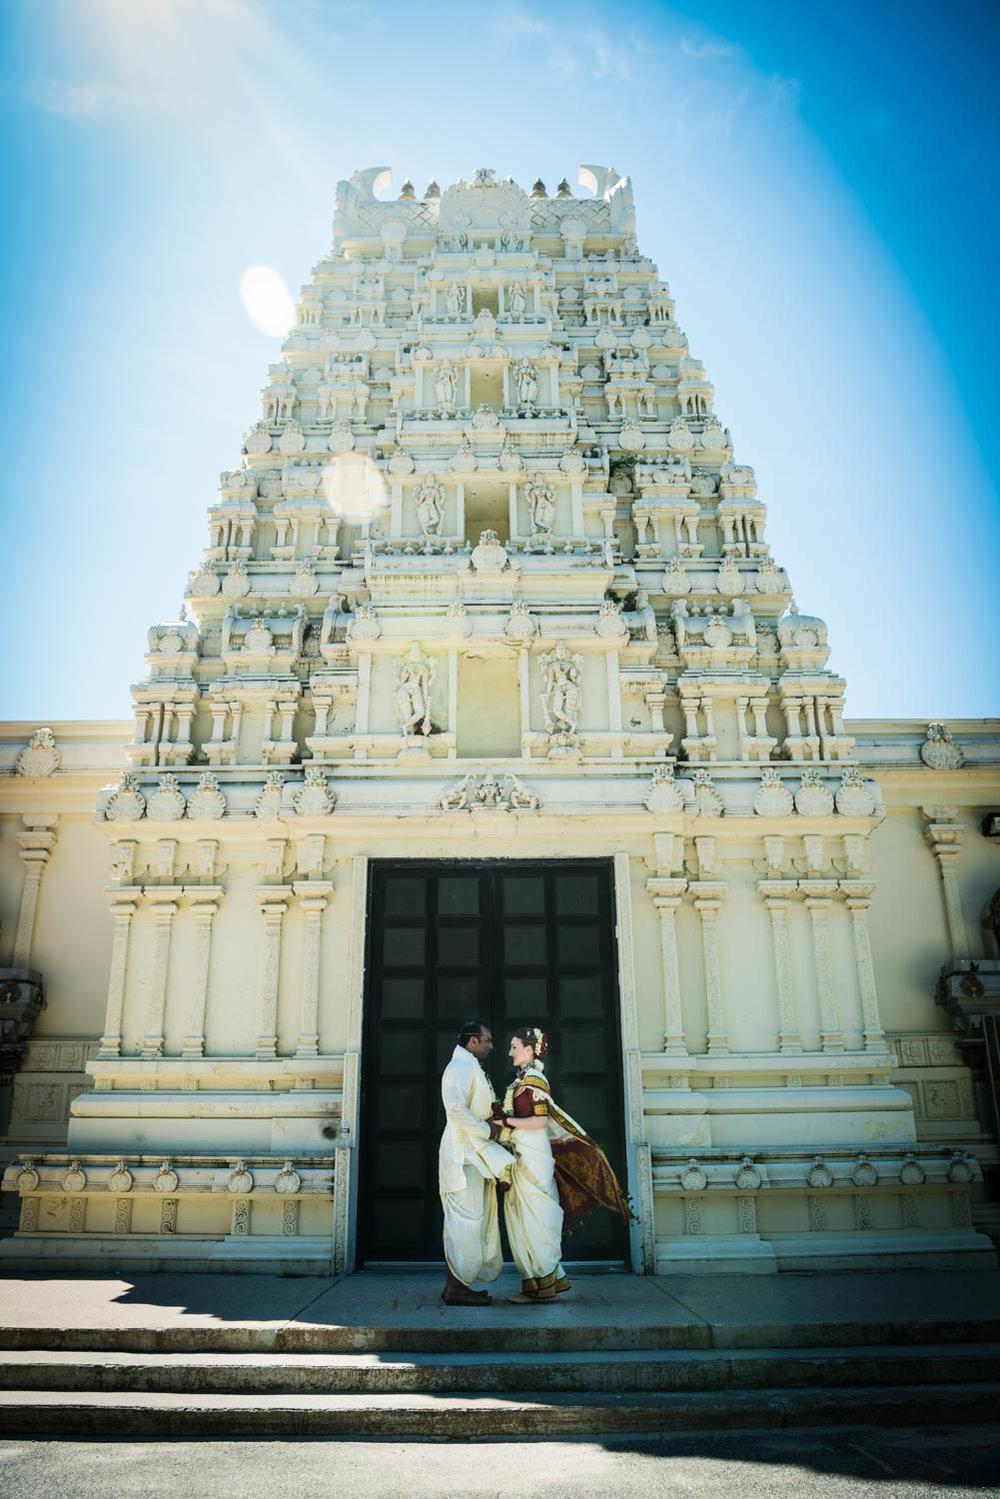 ecaterina-chandu-indian-wedding32.jpg